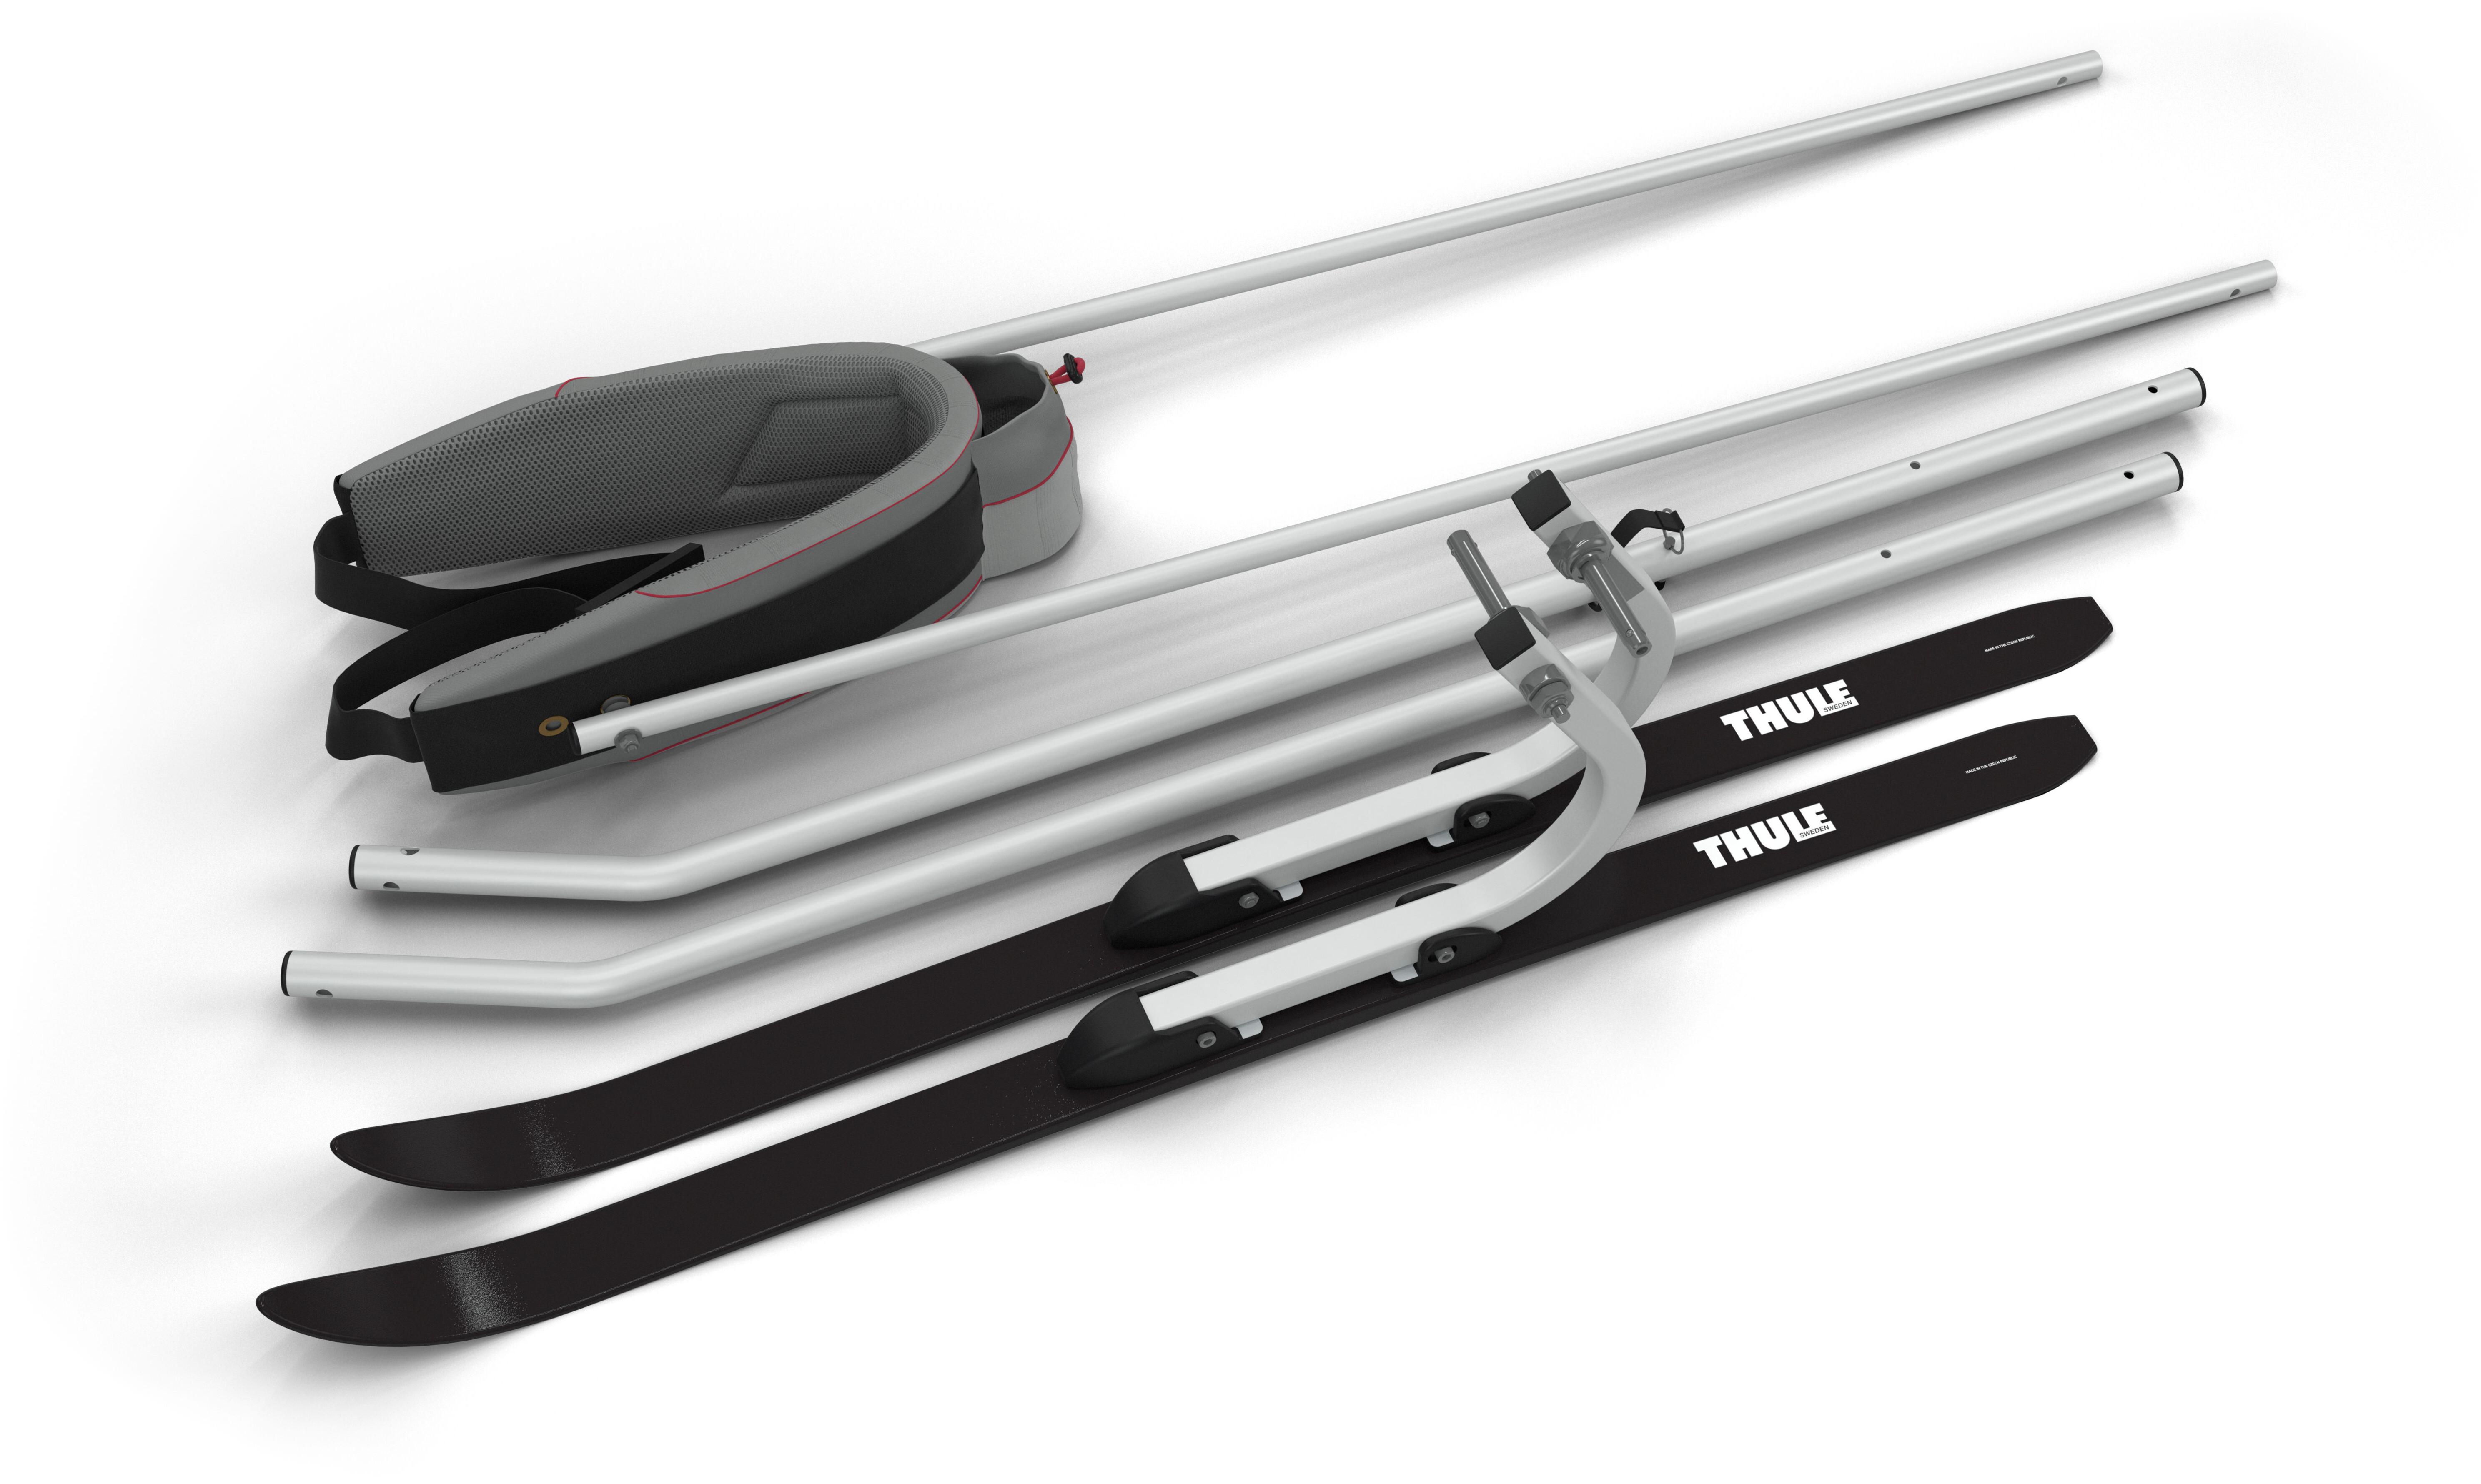 Thule Chariot Ski Kit campzat